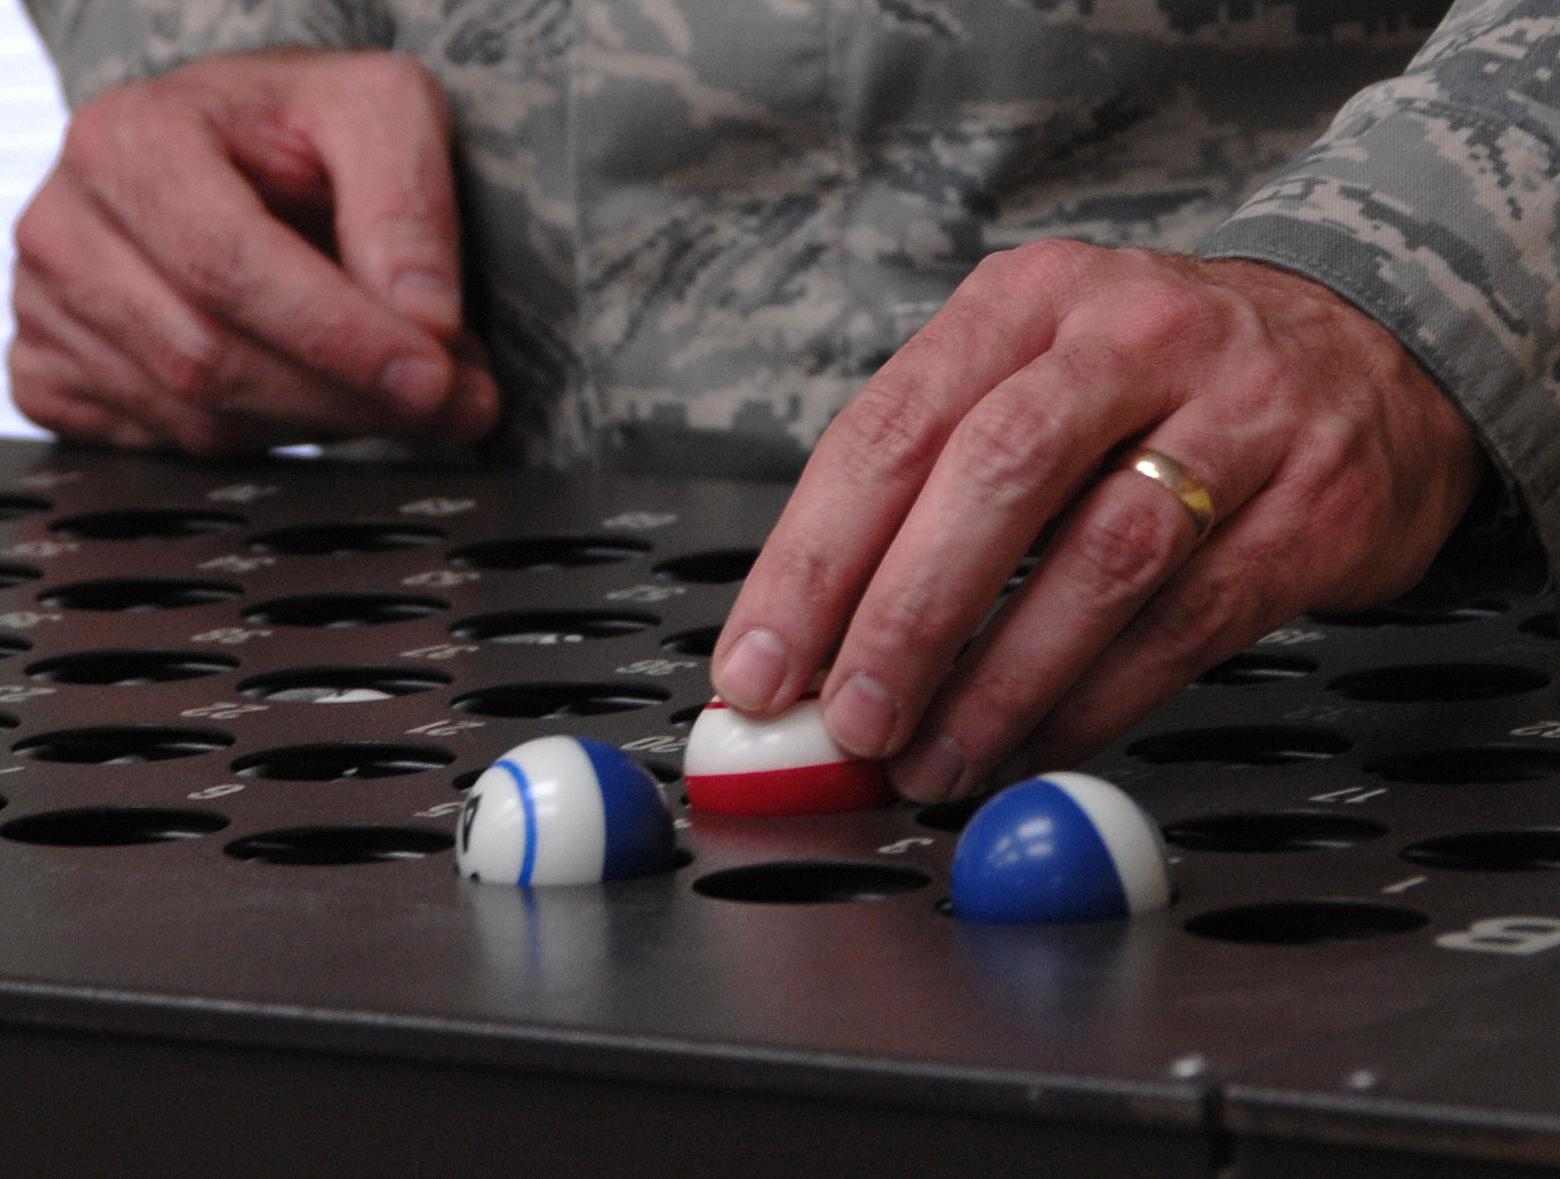 Benefits of Playing Bingo for the Elderly